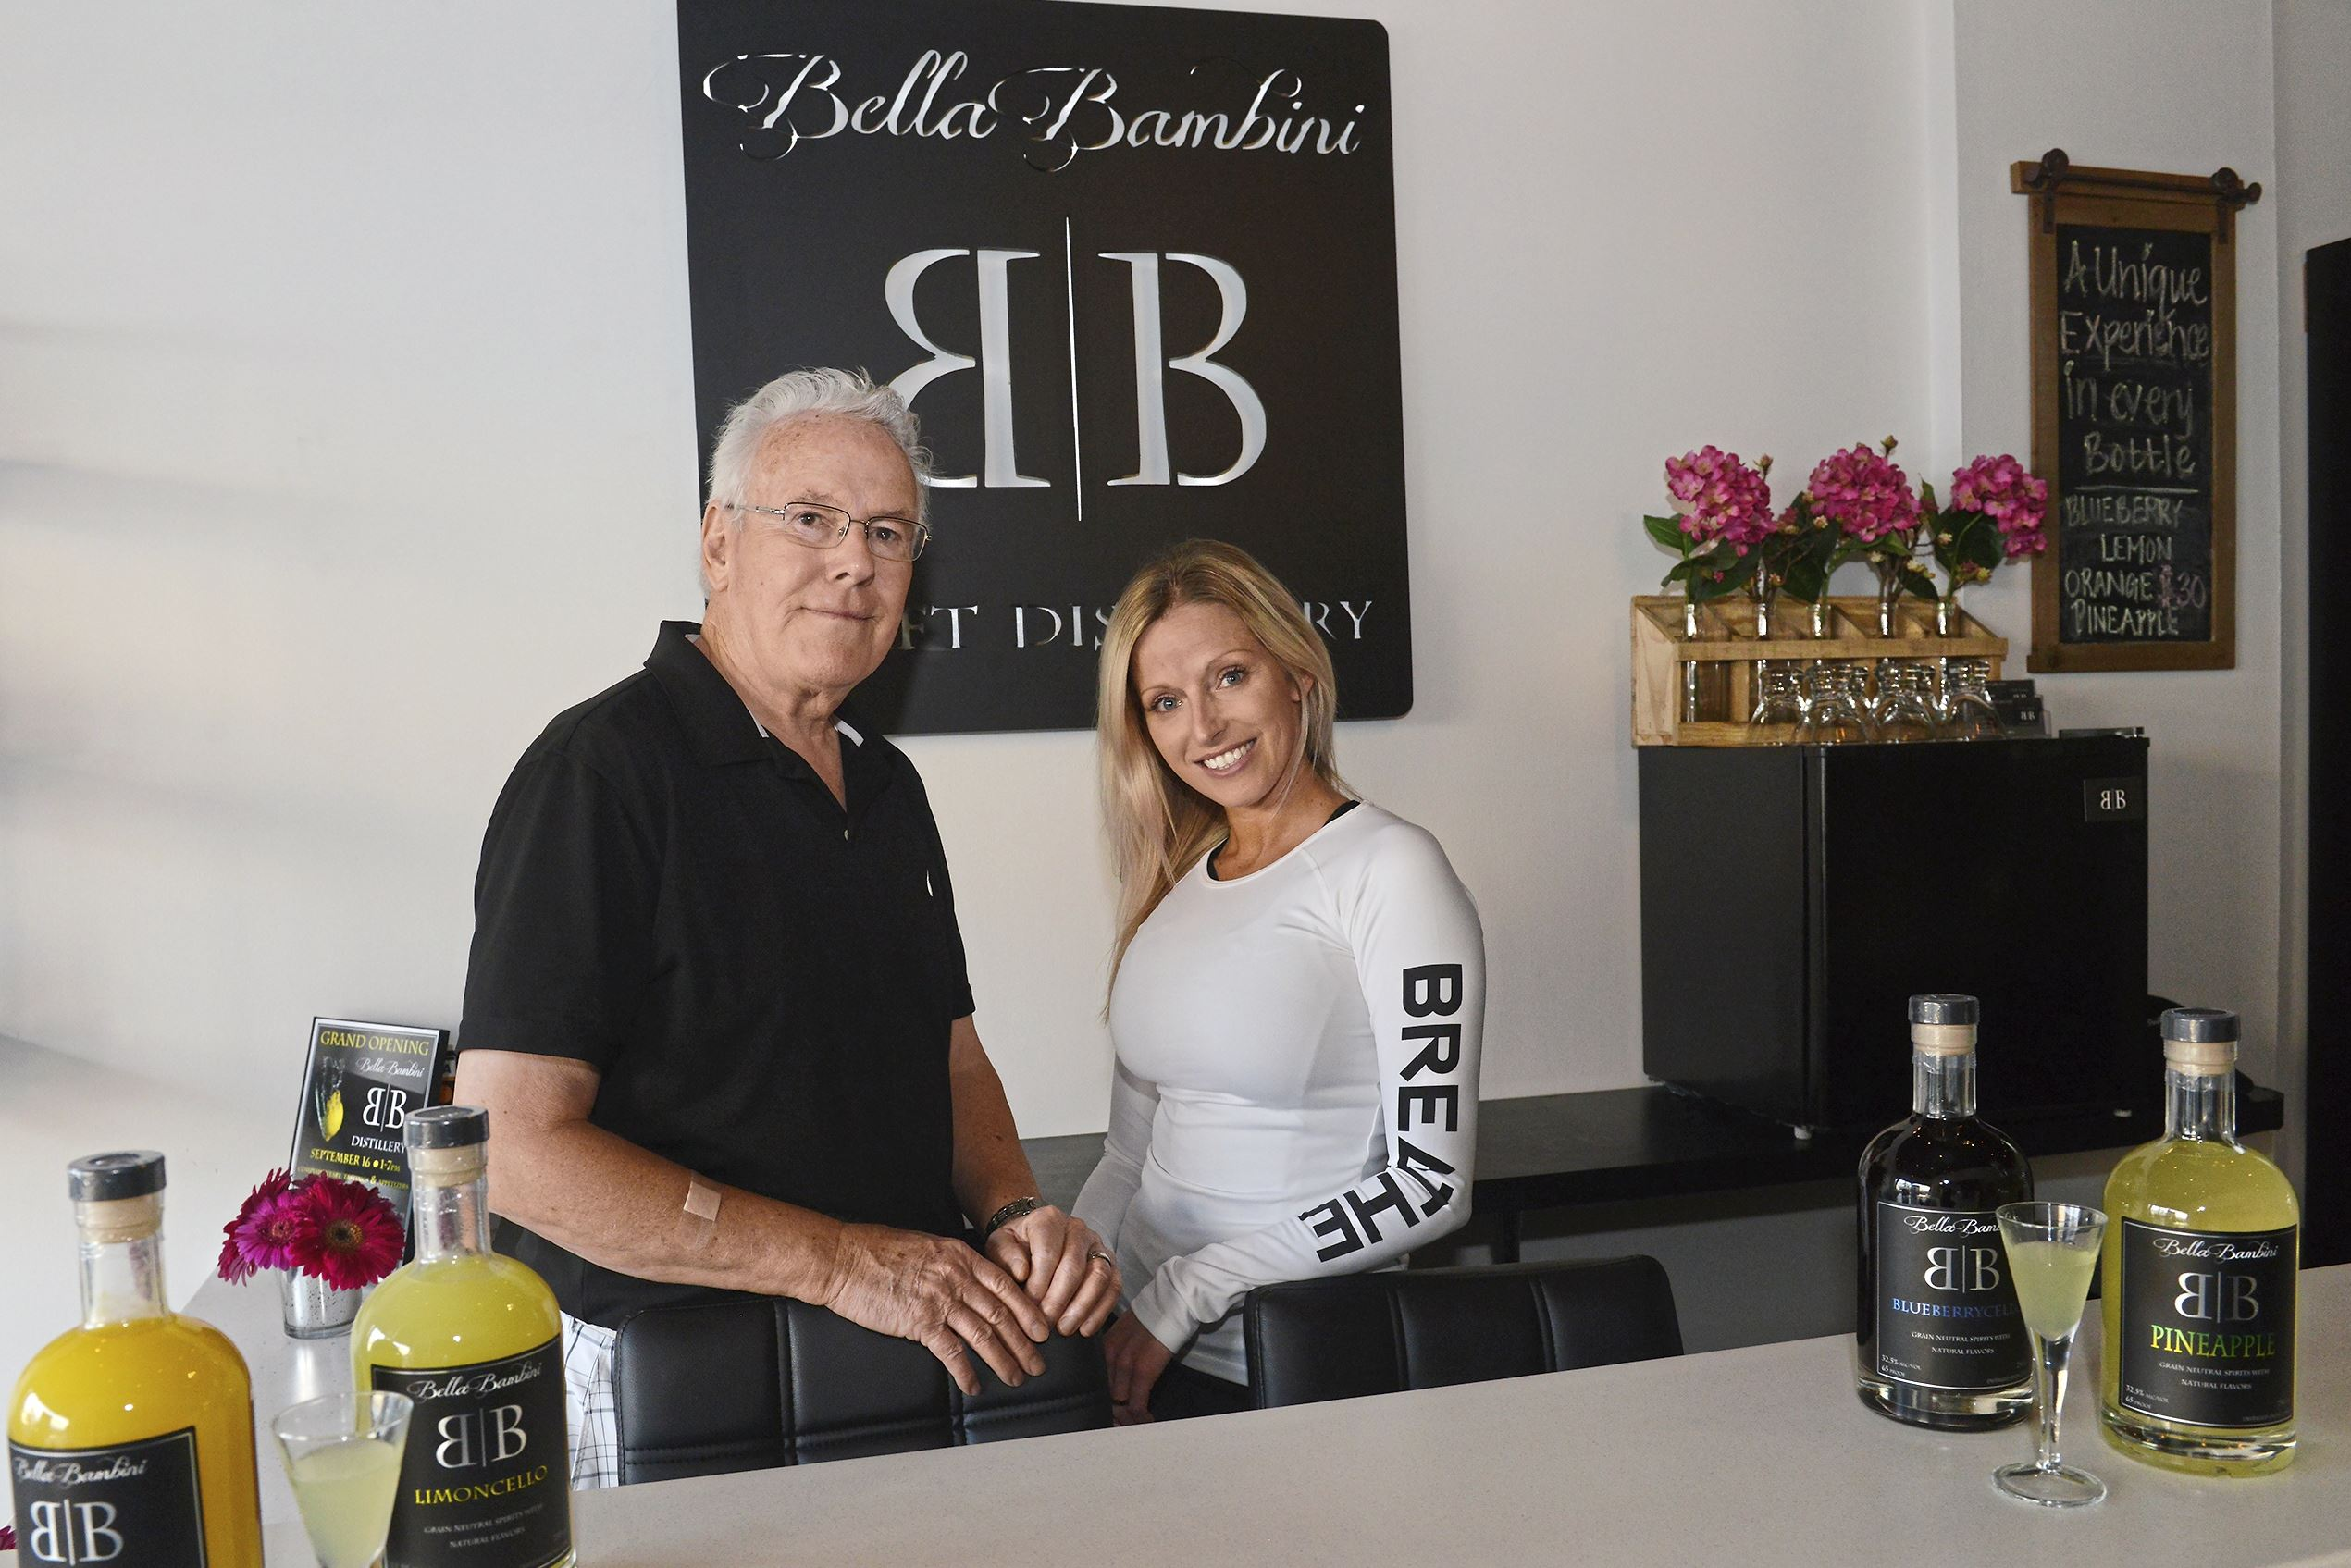 20170921rldBellaBambini06-5 Jim Breen and his granddaugther Brittany Breen at Bella Bambini Craft Distillery in Coraopolis.